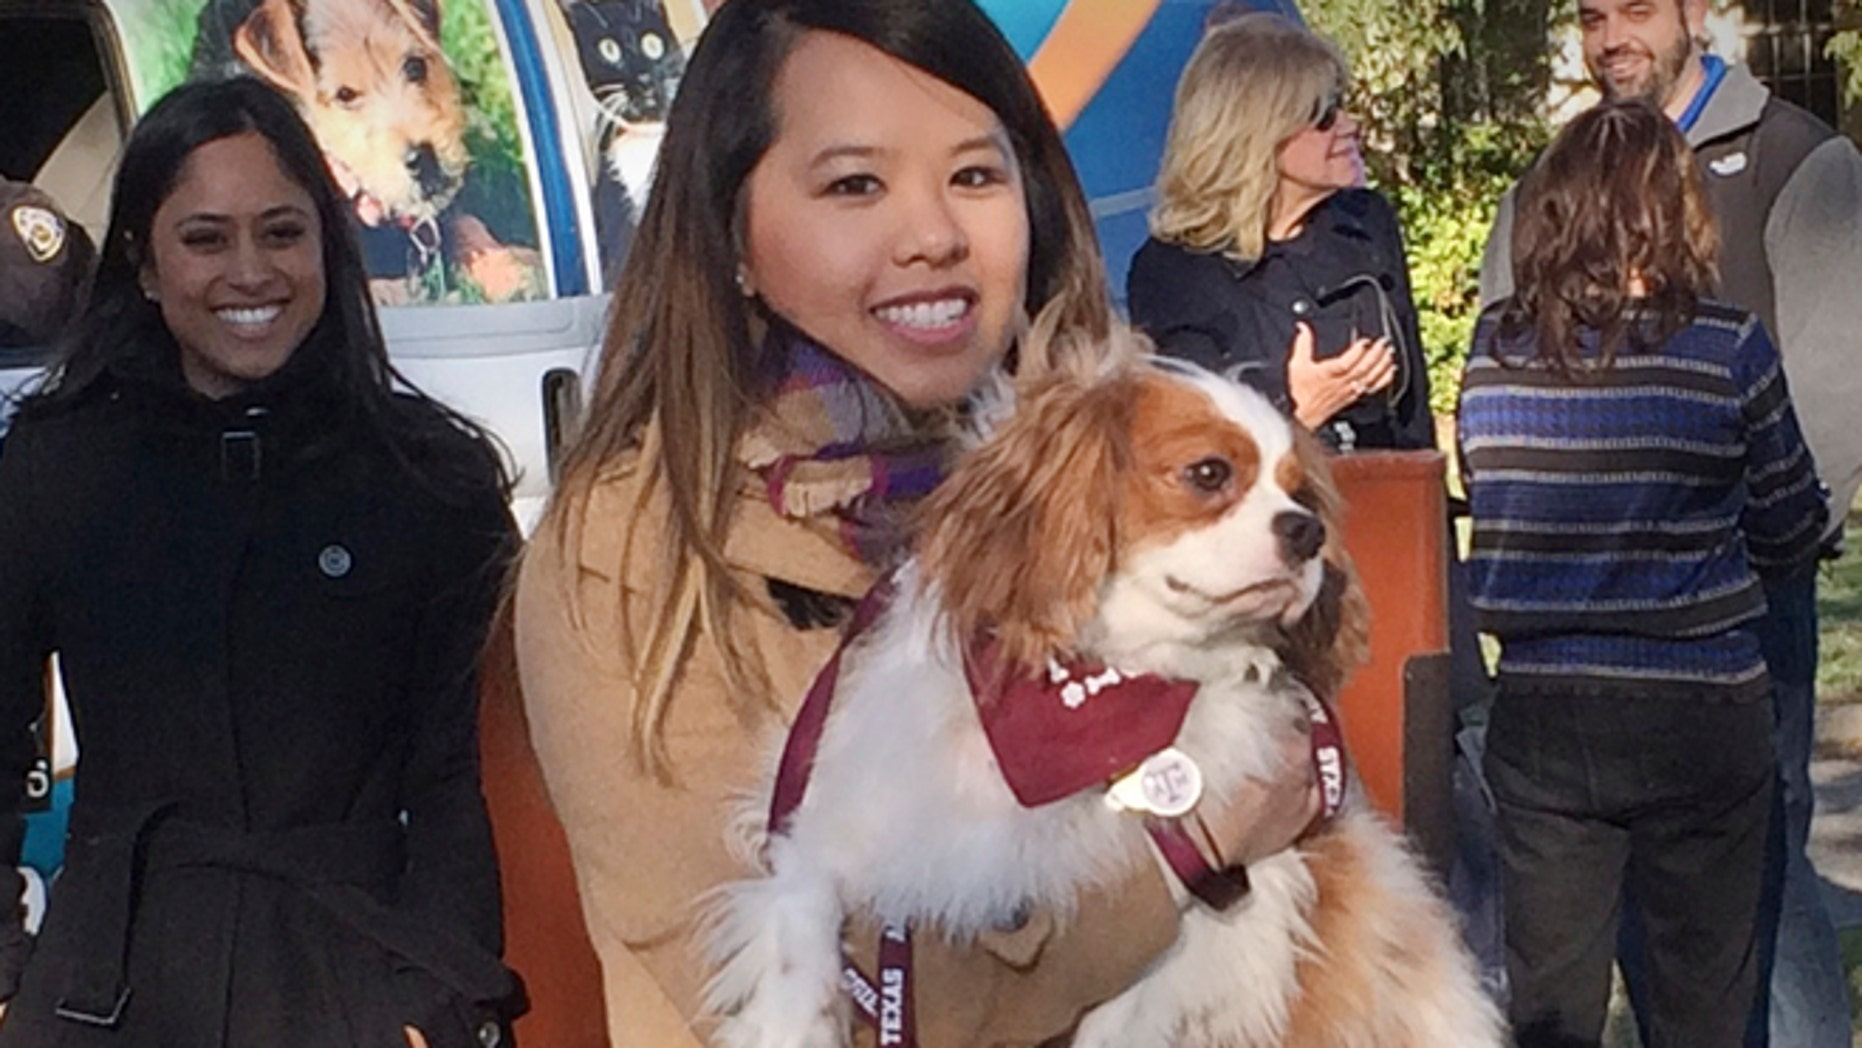 Nov. 1: Ebola survivor Nina Pham is reunited with her dog Bentley at the Dallas Animal Services Center in Dallas.